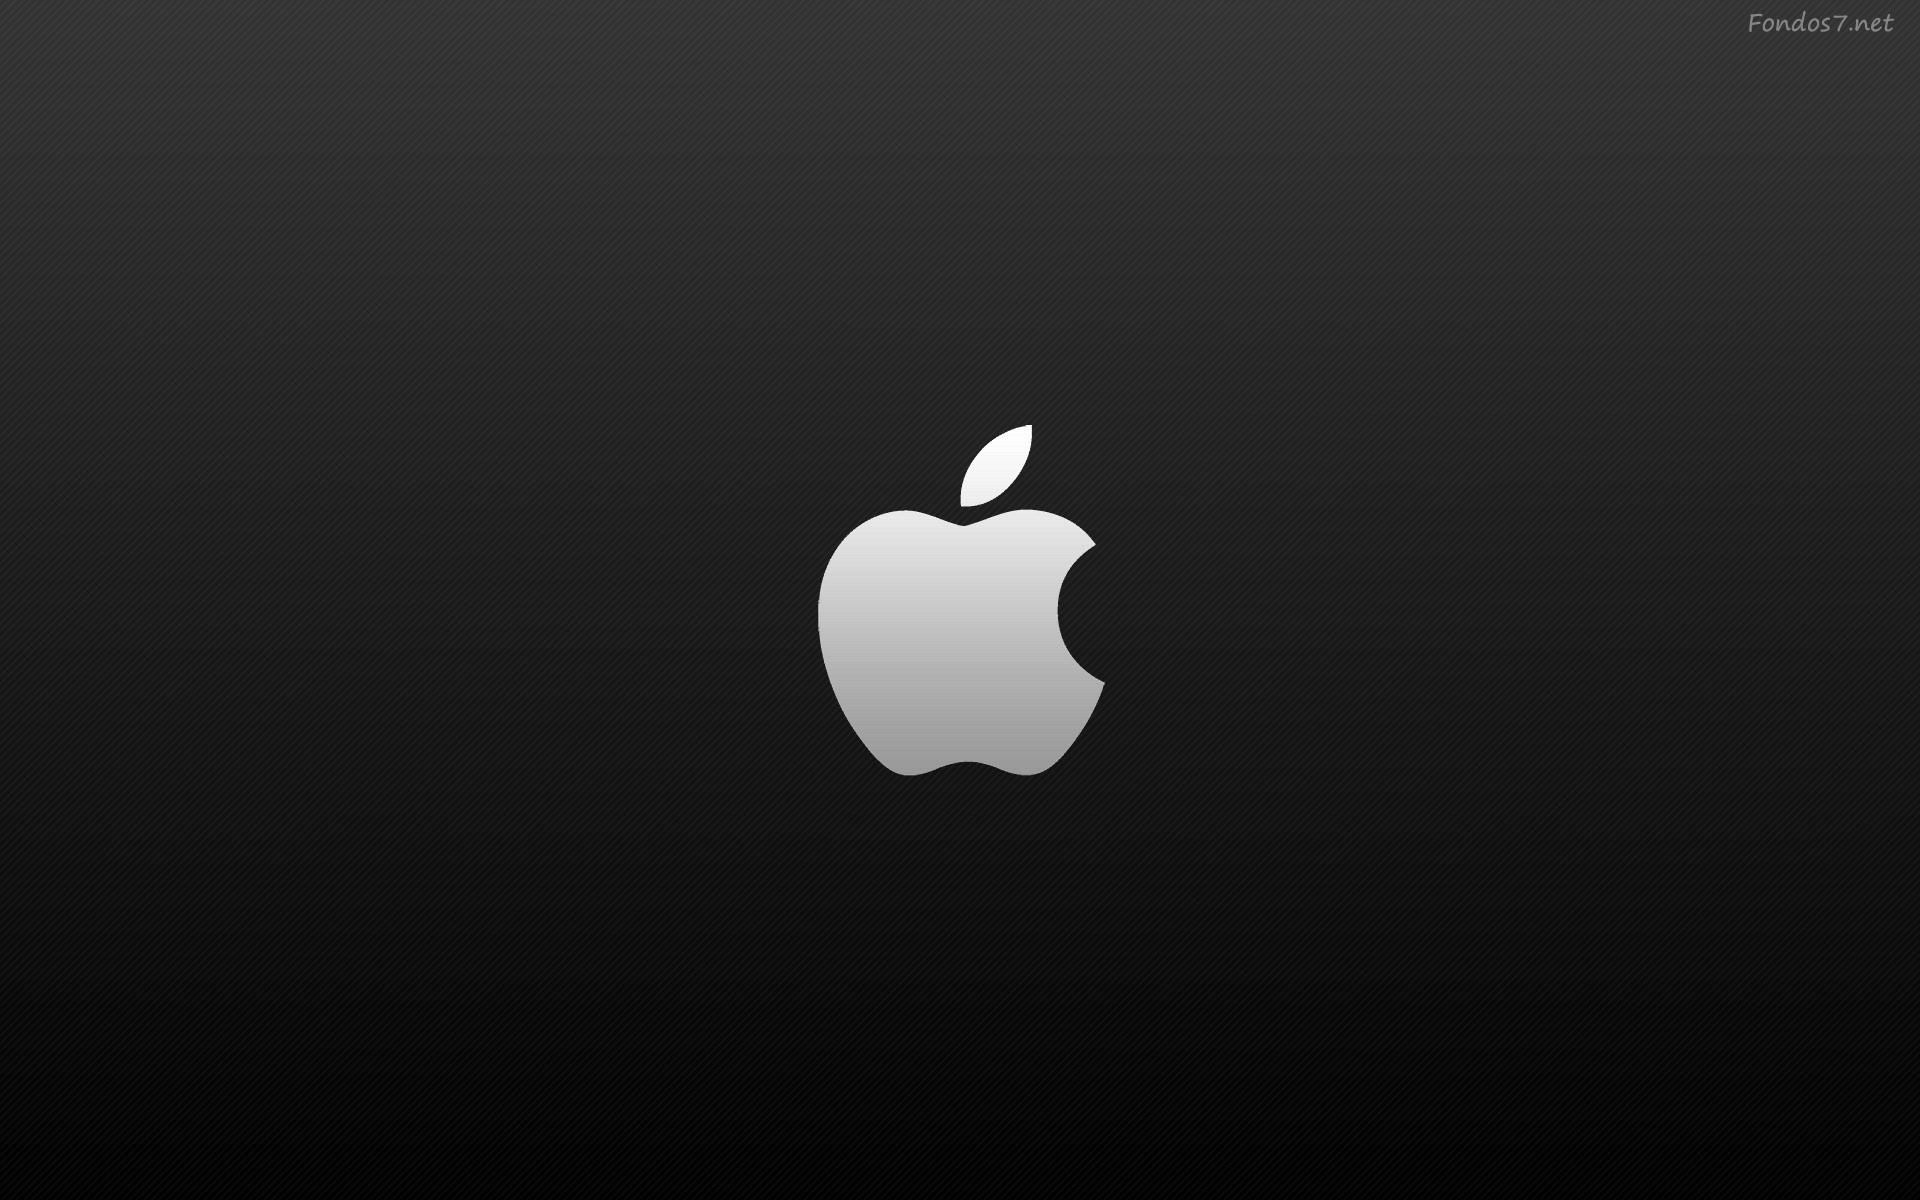 mac apple logo wallpaper widescreen wallpapers 1920x1200 fondos7net 1920x1200